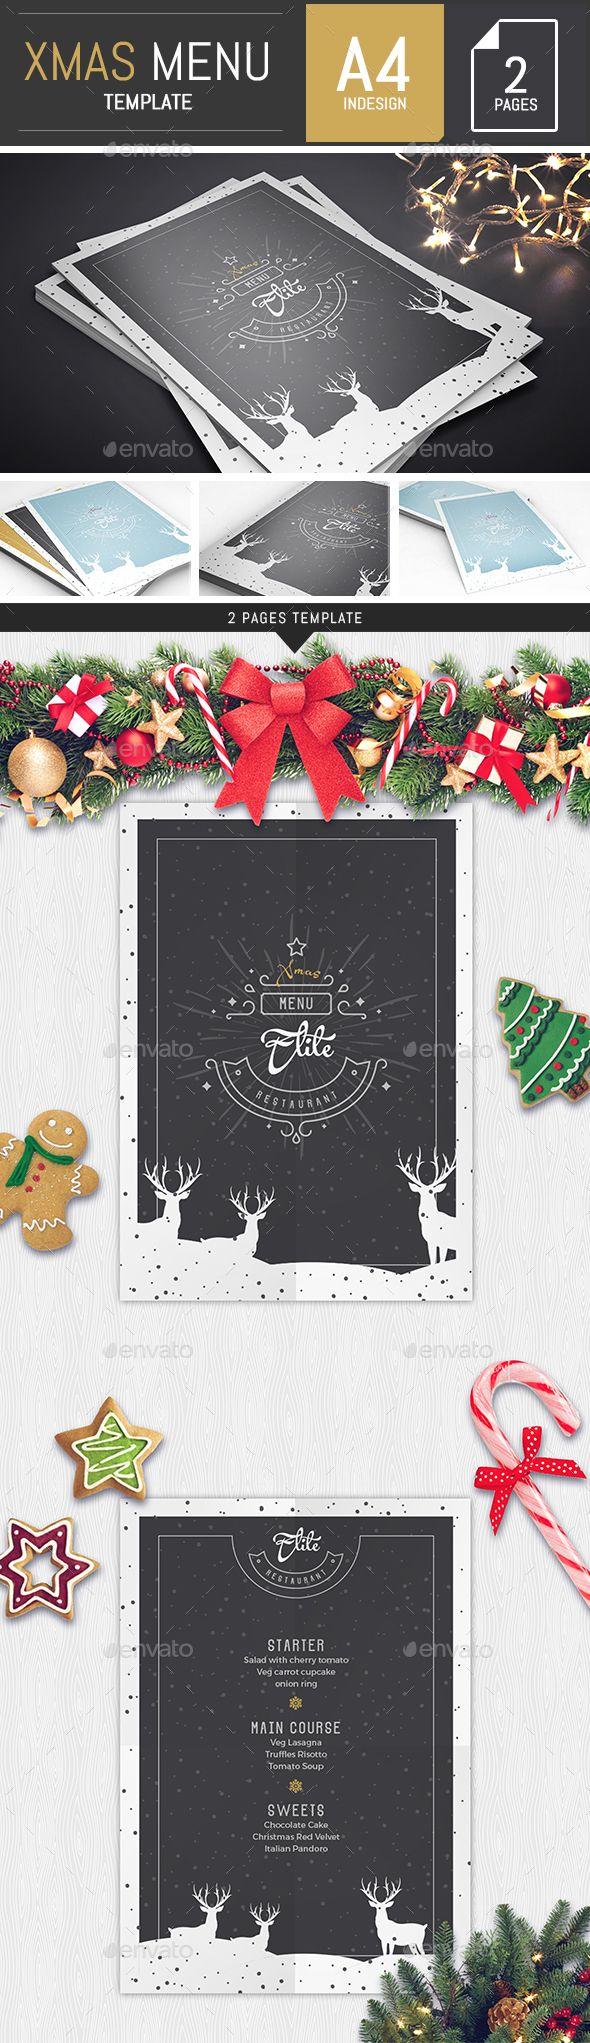 A4 Modern Christmas Menu Template | Logotipos, Navidad y Tarjetas